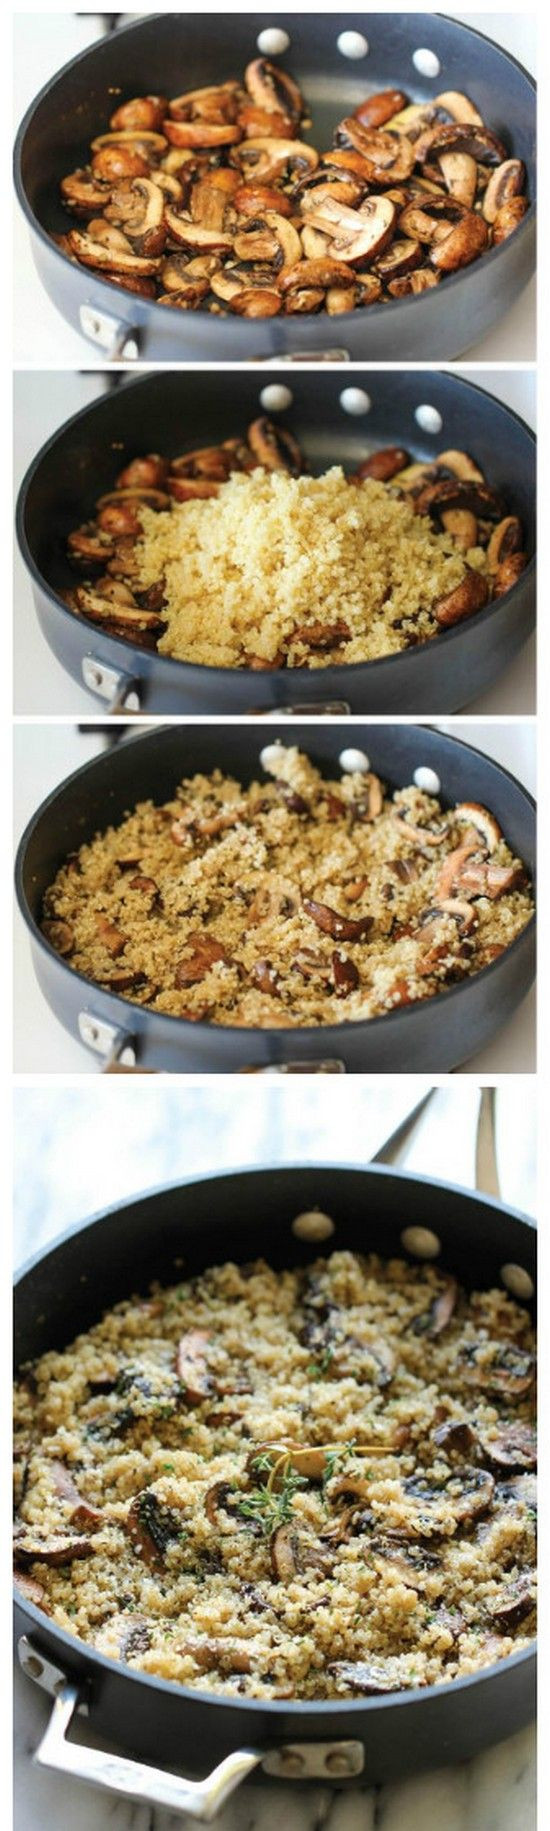 Healthy Side Dishes For Dinner  Garlic Mushroom Quinoa